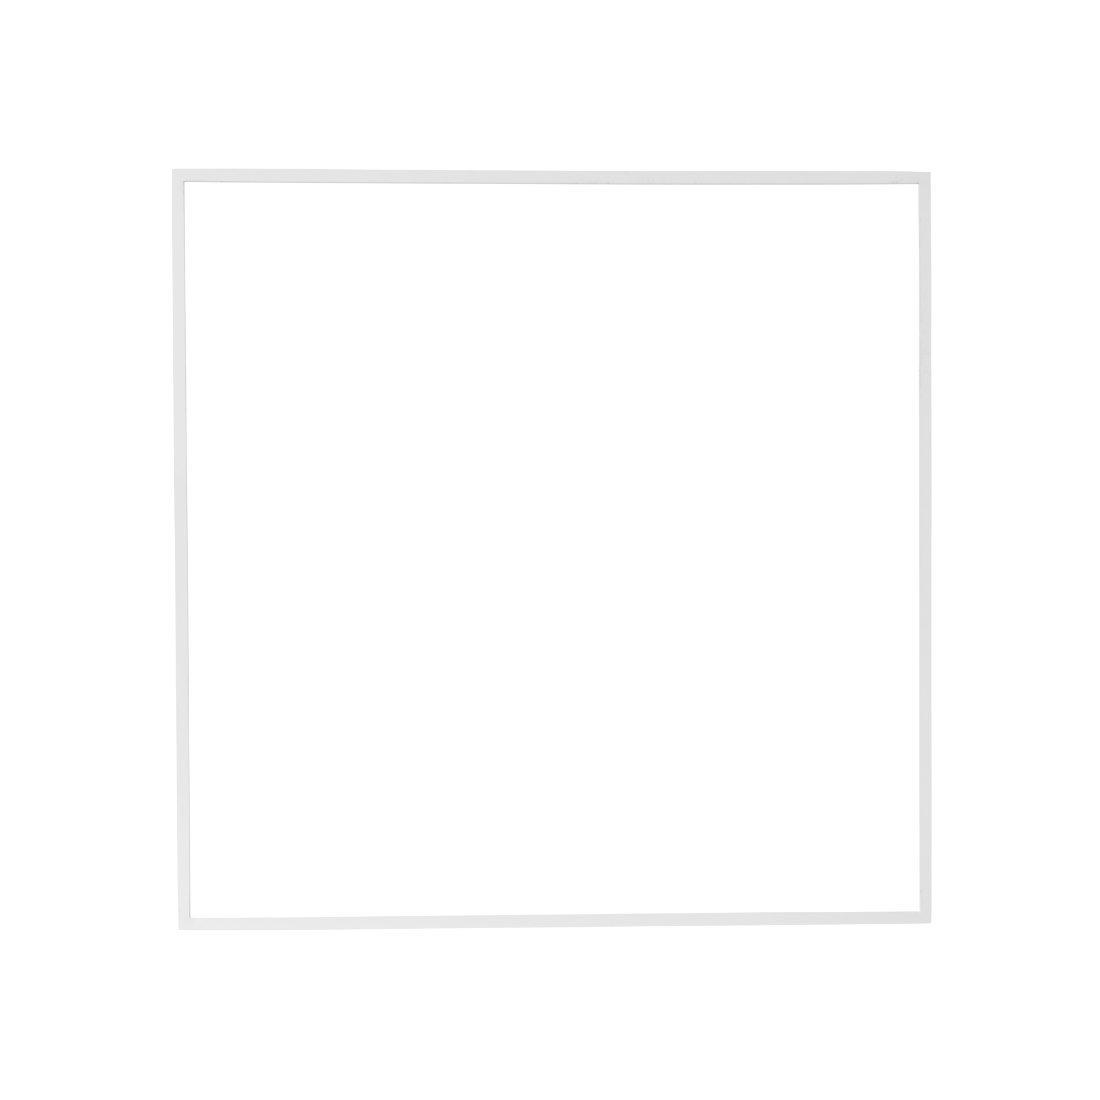 Op zoek naar Default Category > SALE? Hier vind je Menu Design Still Frame Square White Wanddecoratie snel en voordelig bezorgd